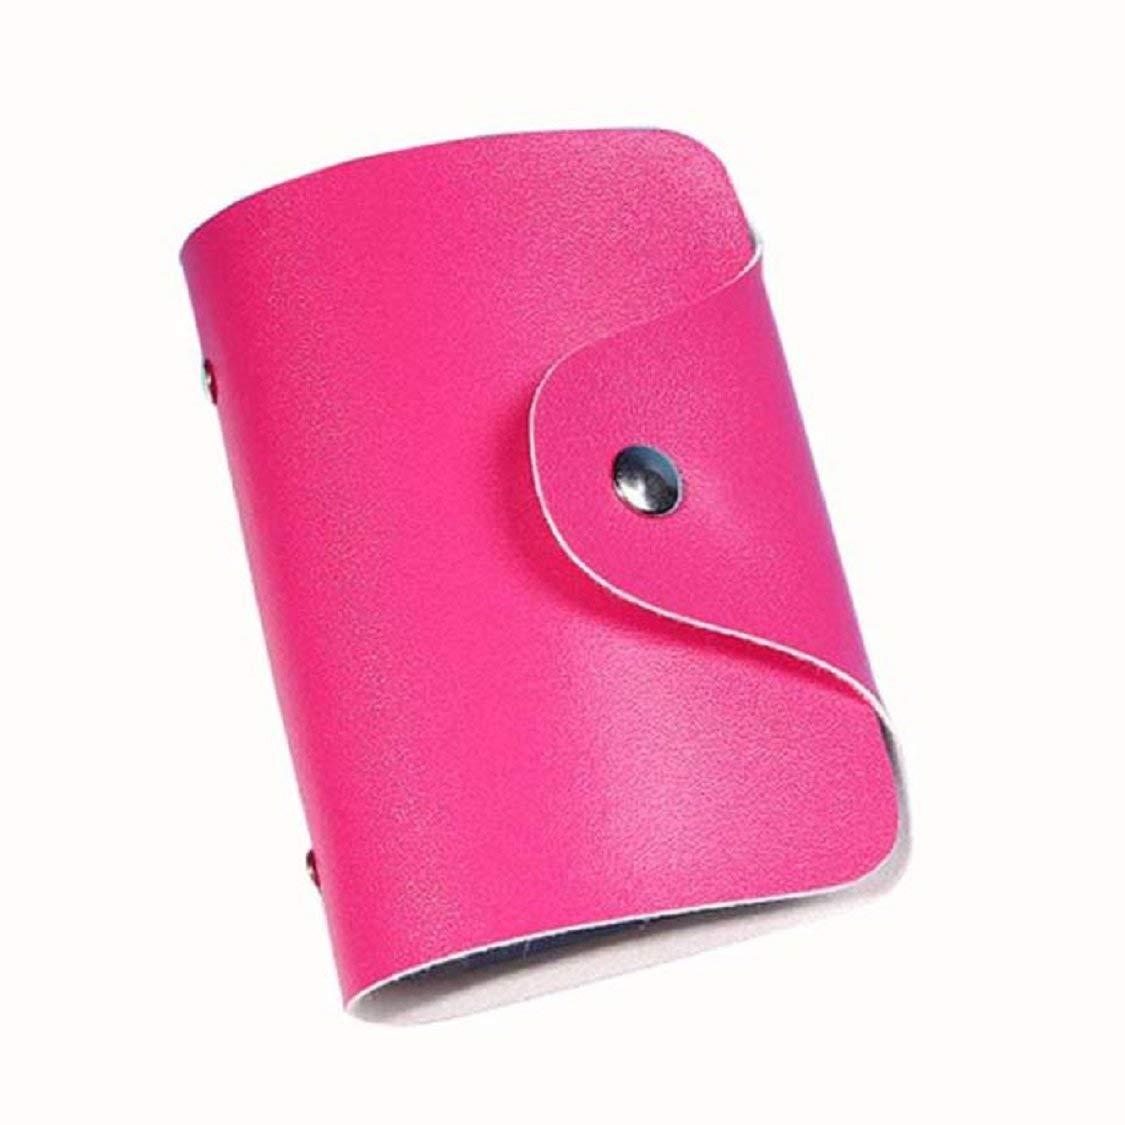 20349c0fcd779 Get Quotations · Ikevan Men Women Leather Credit Card Holder Case Card  Holder Wallet Business Card (Hot Pink